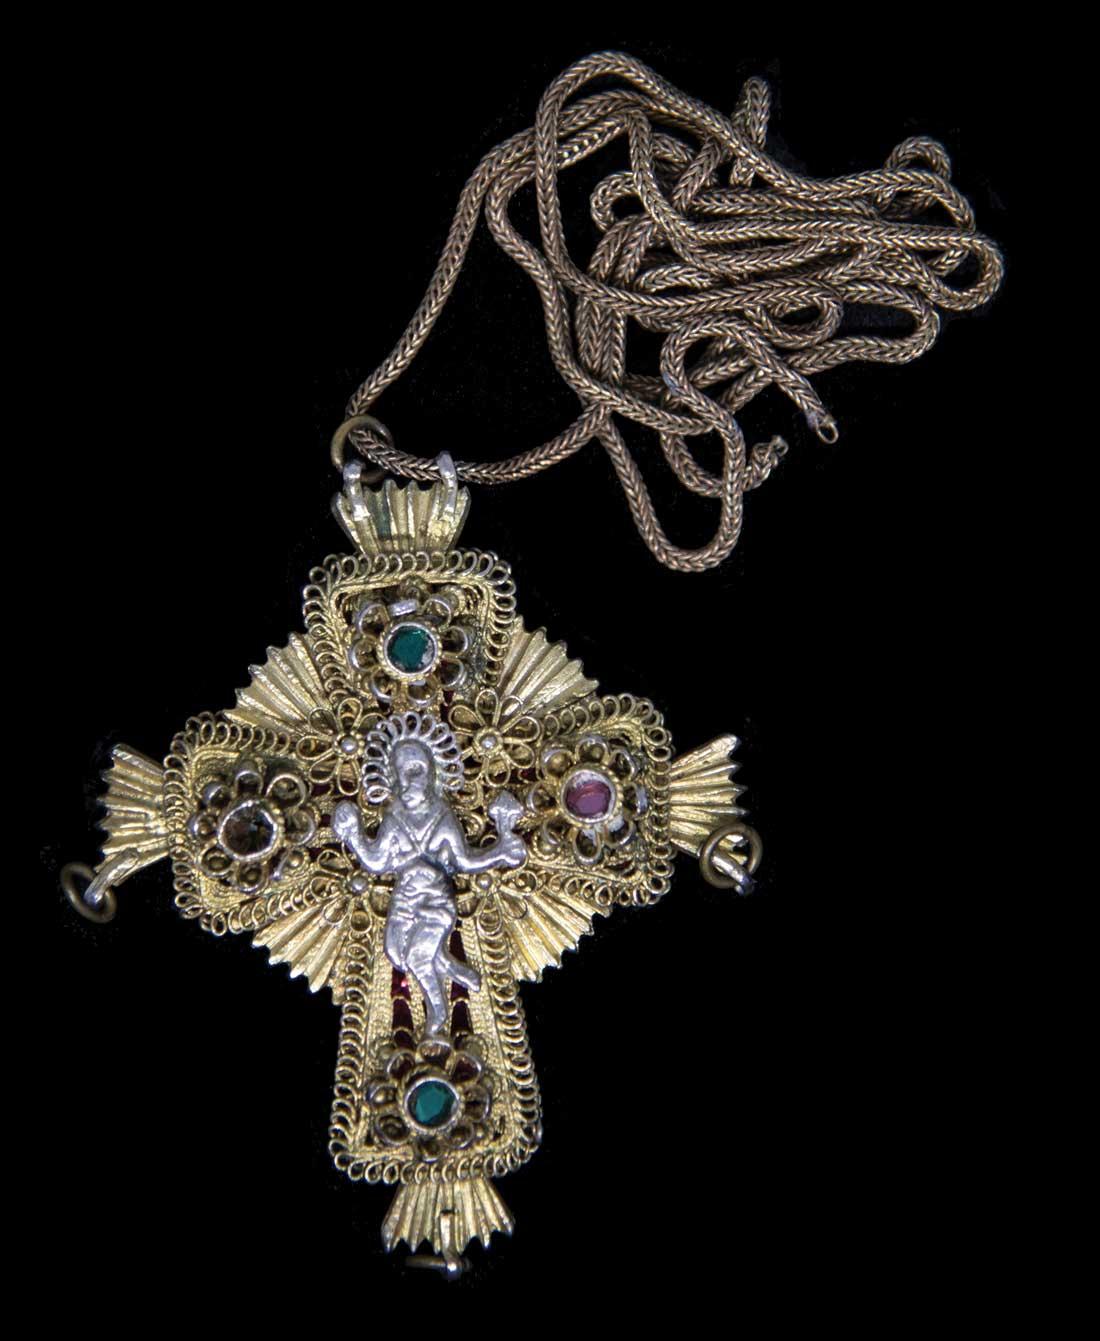 Crosses - amulets